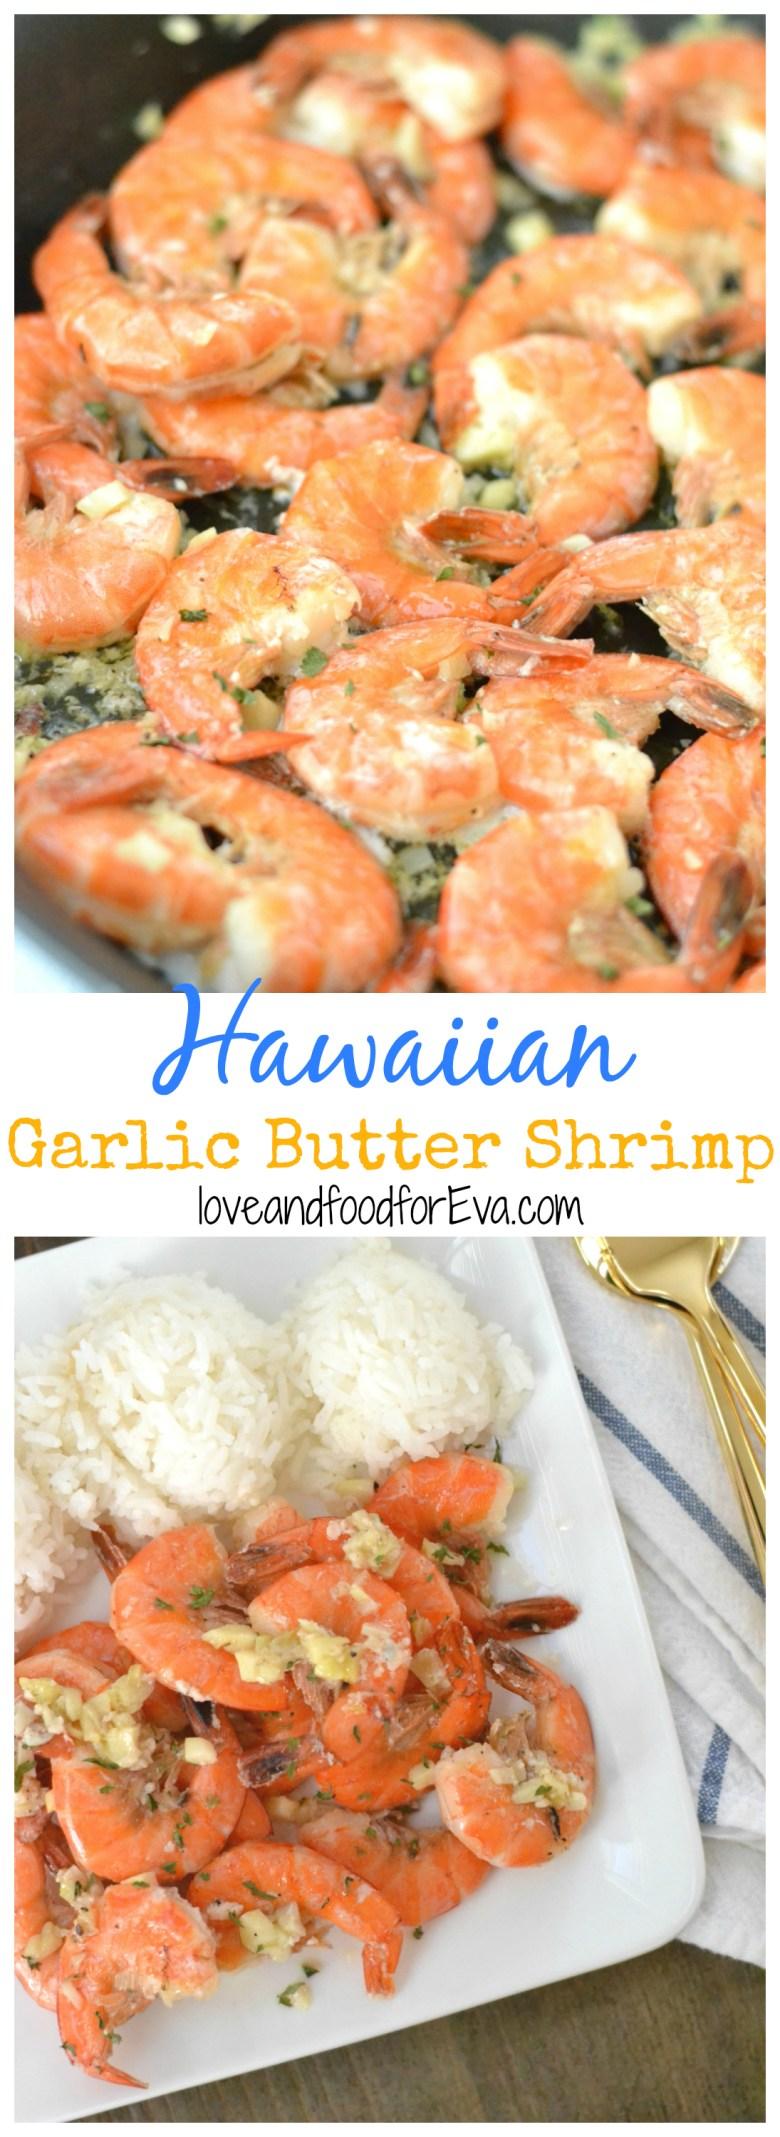 Hawaiian Garlic Butter Shrimp - inspired by the North Shore food trucks in Oahu!